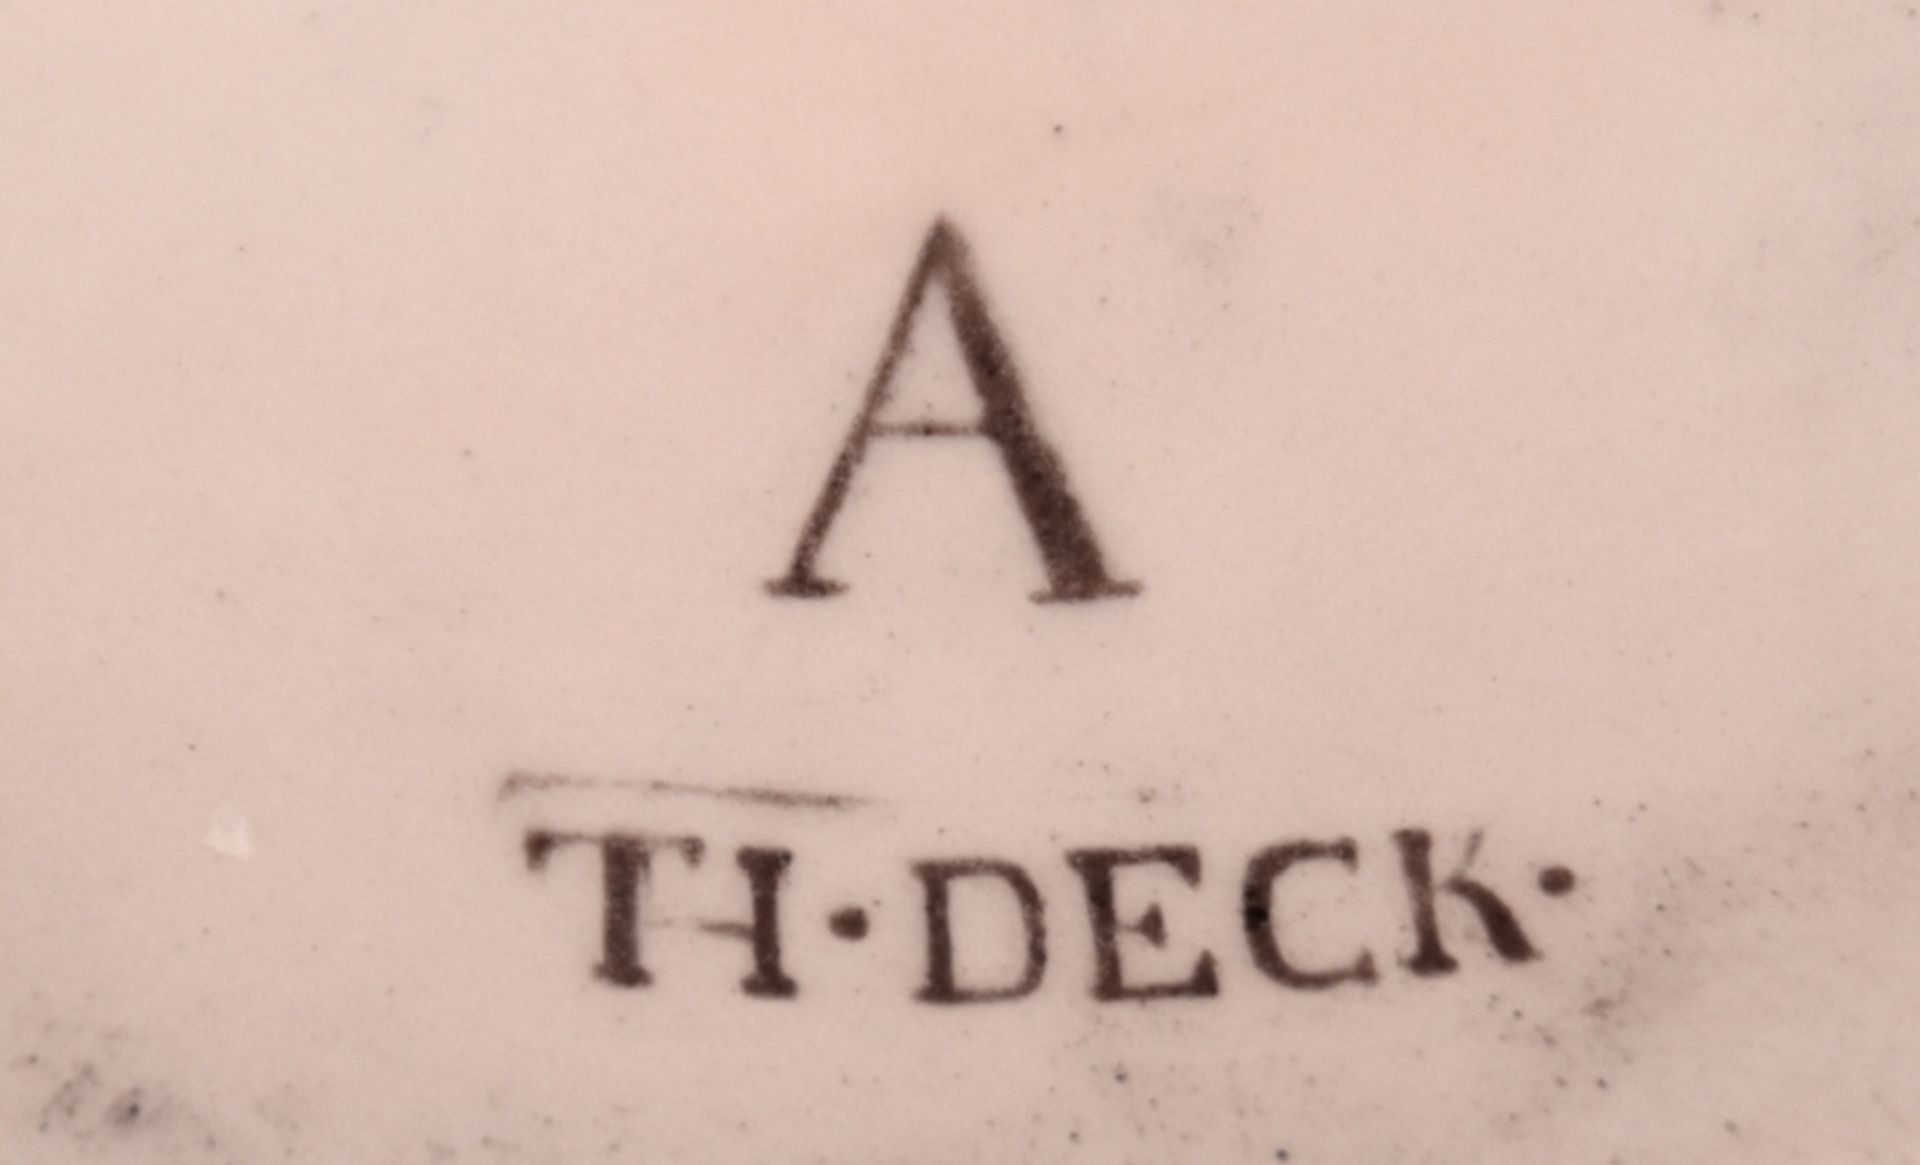 REPRÄSENTATIVE SCHALE Théodore Deck - Image 6 of 6